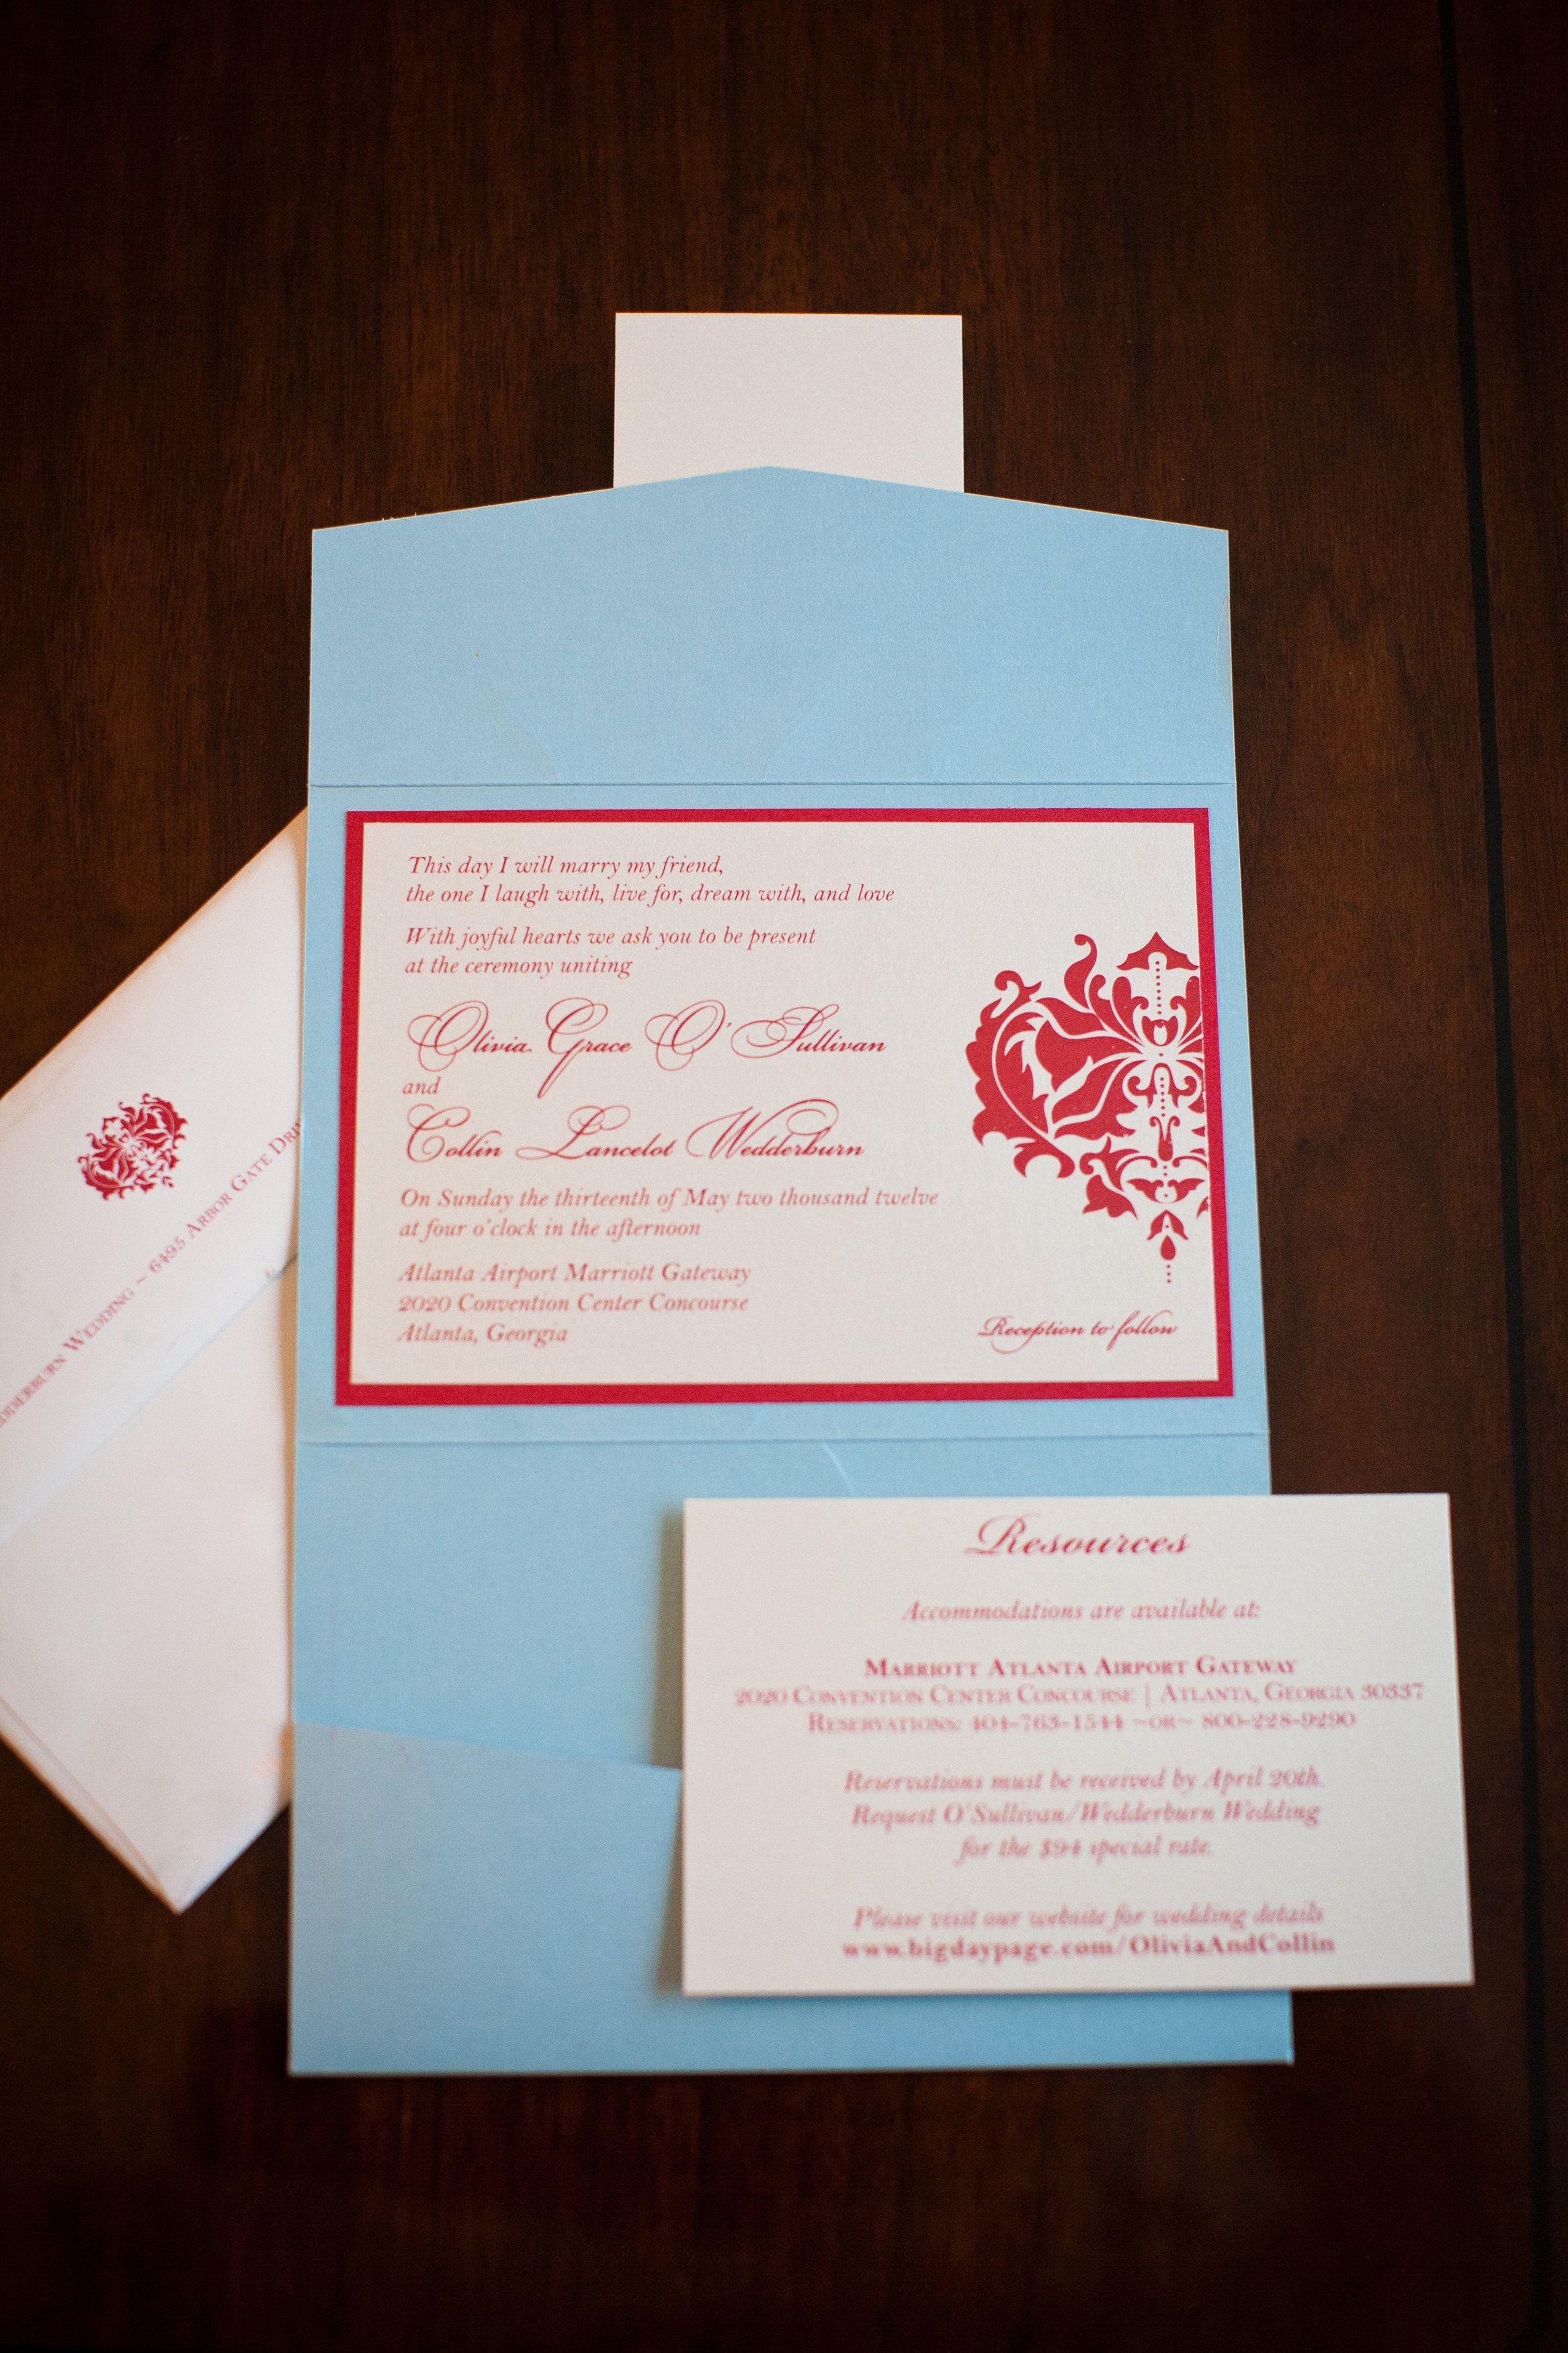 Red and Aqua Wedding Invitation | Idyllic Fete Weddings | Pinterest ...